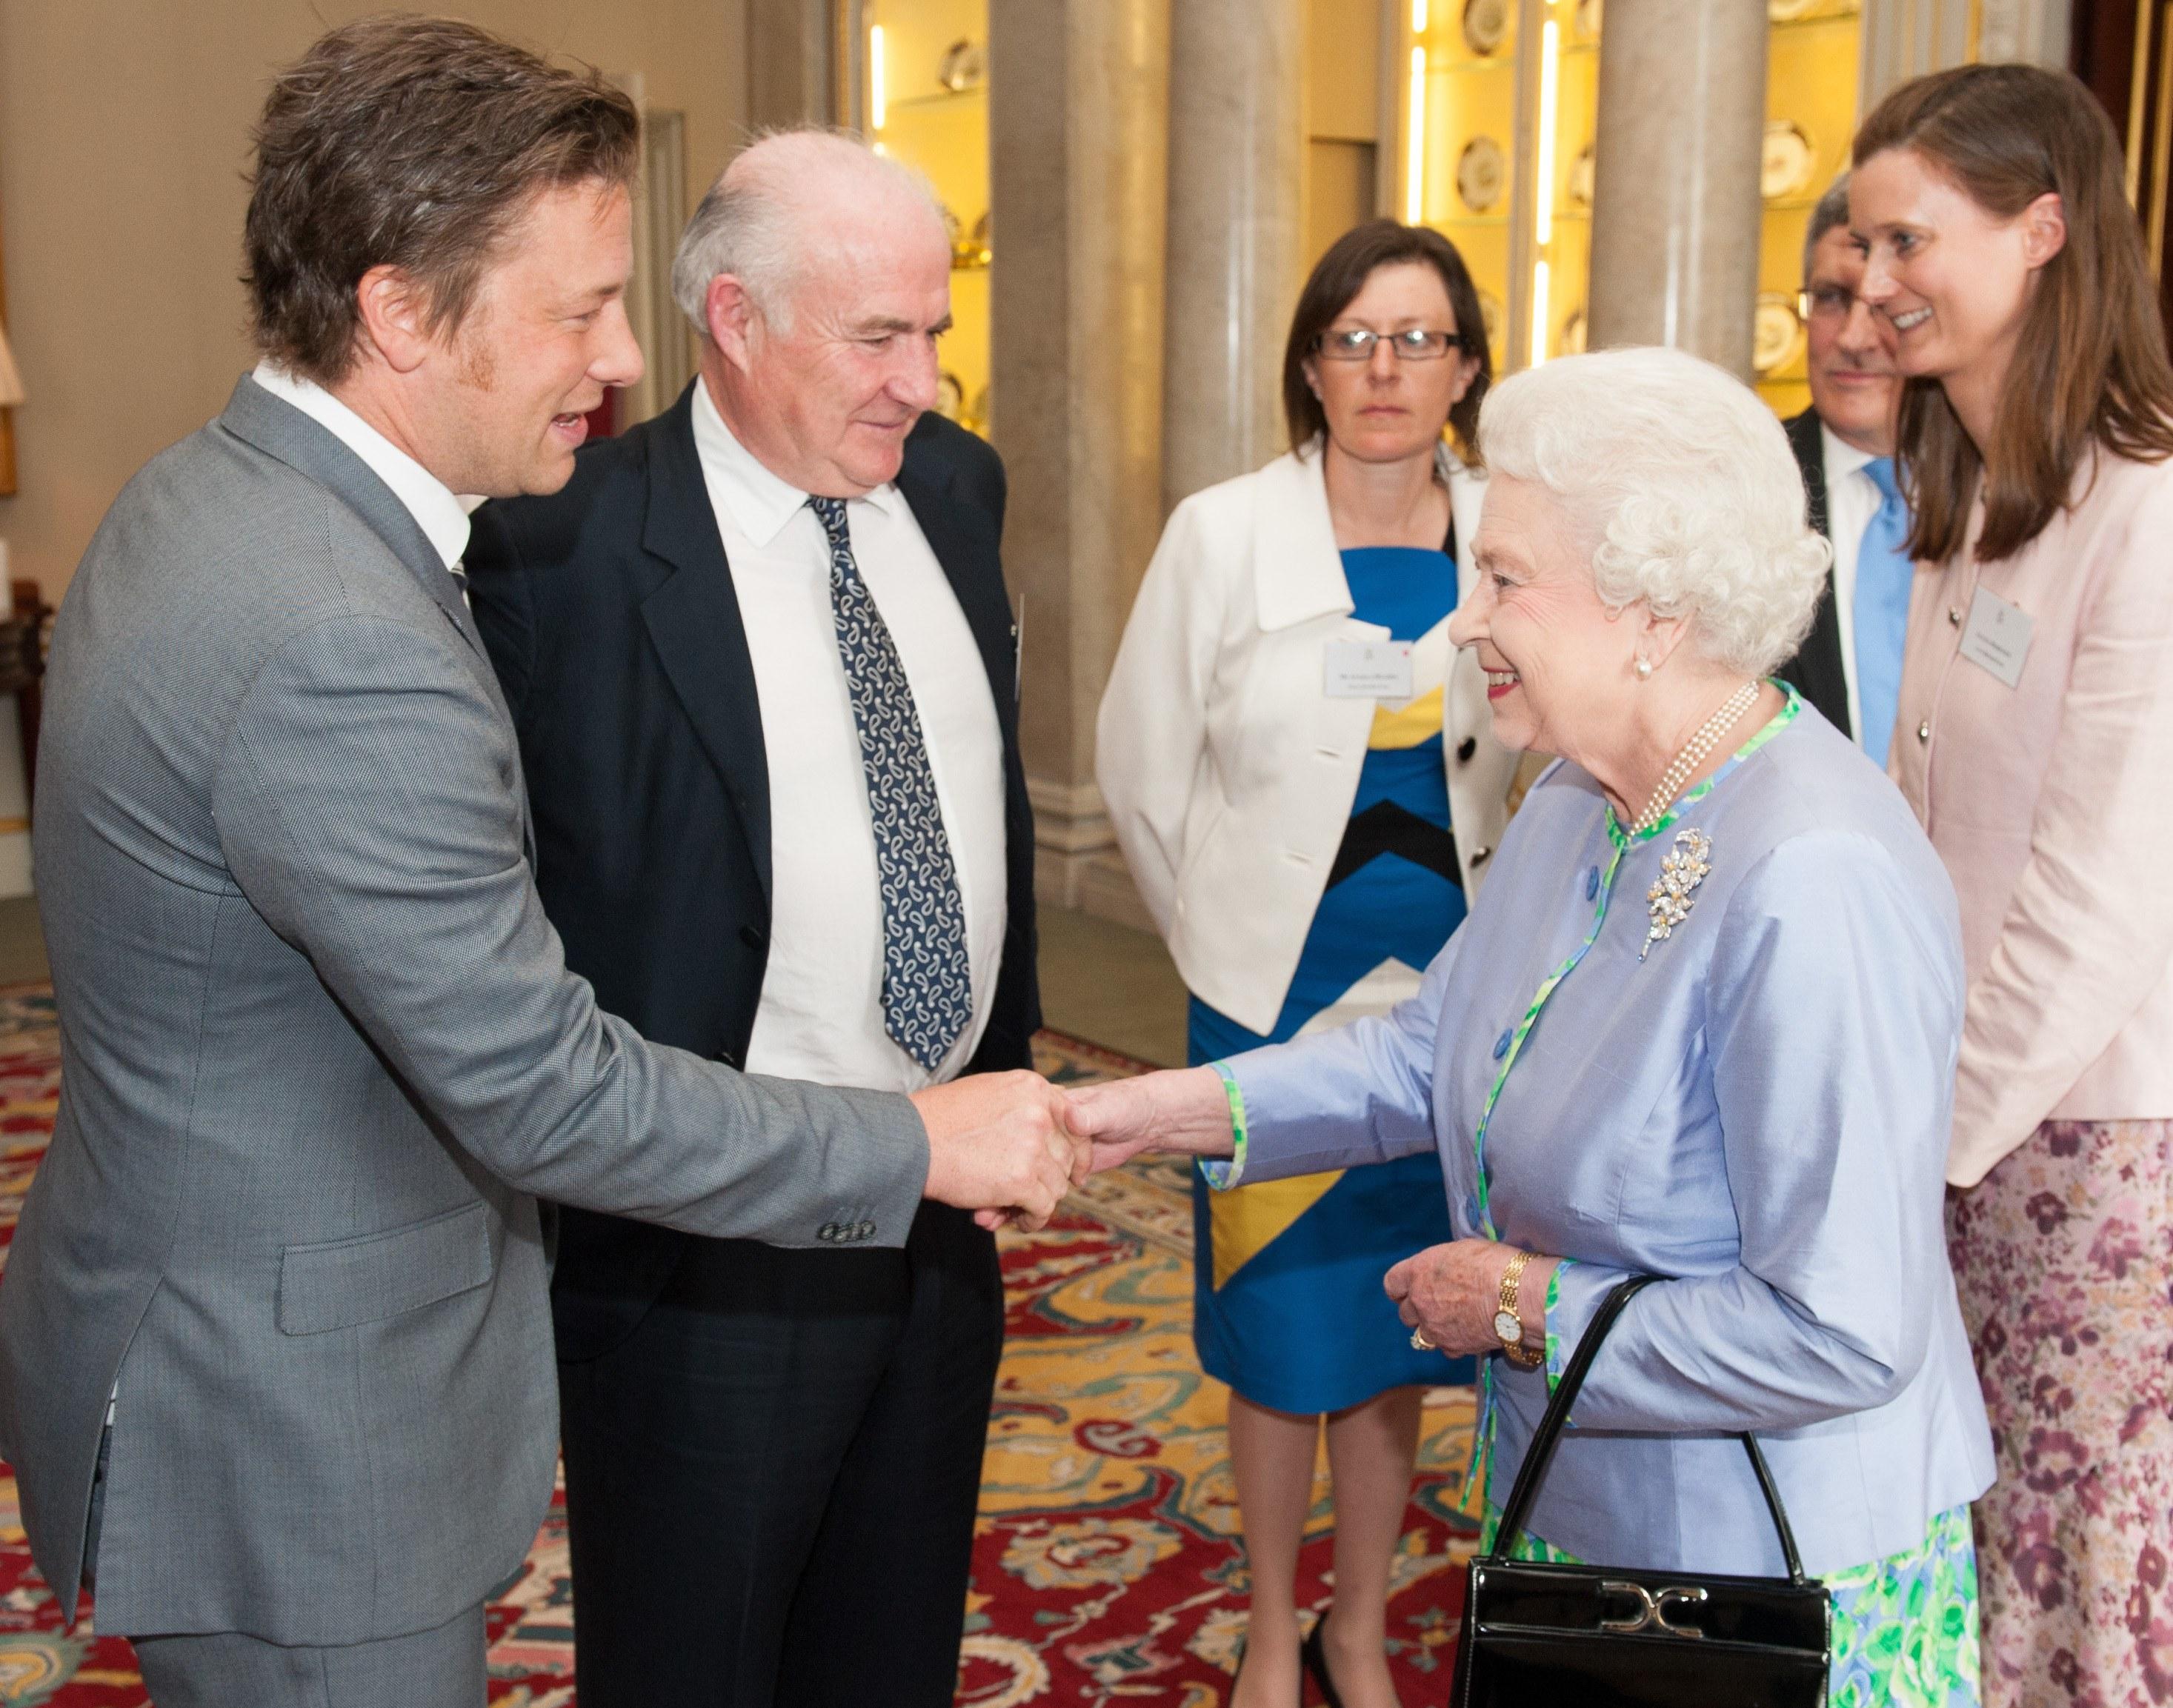 Chef Jamie Oliver shakes hands with Queen Elizabeth